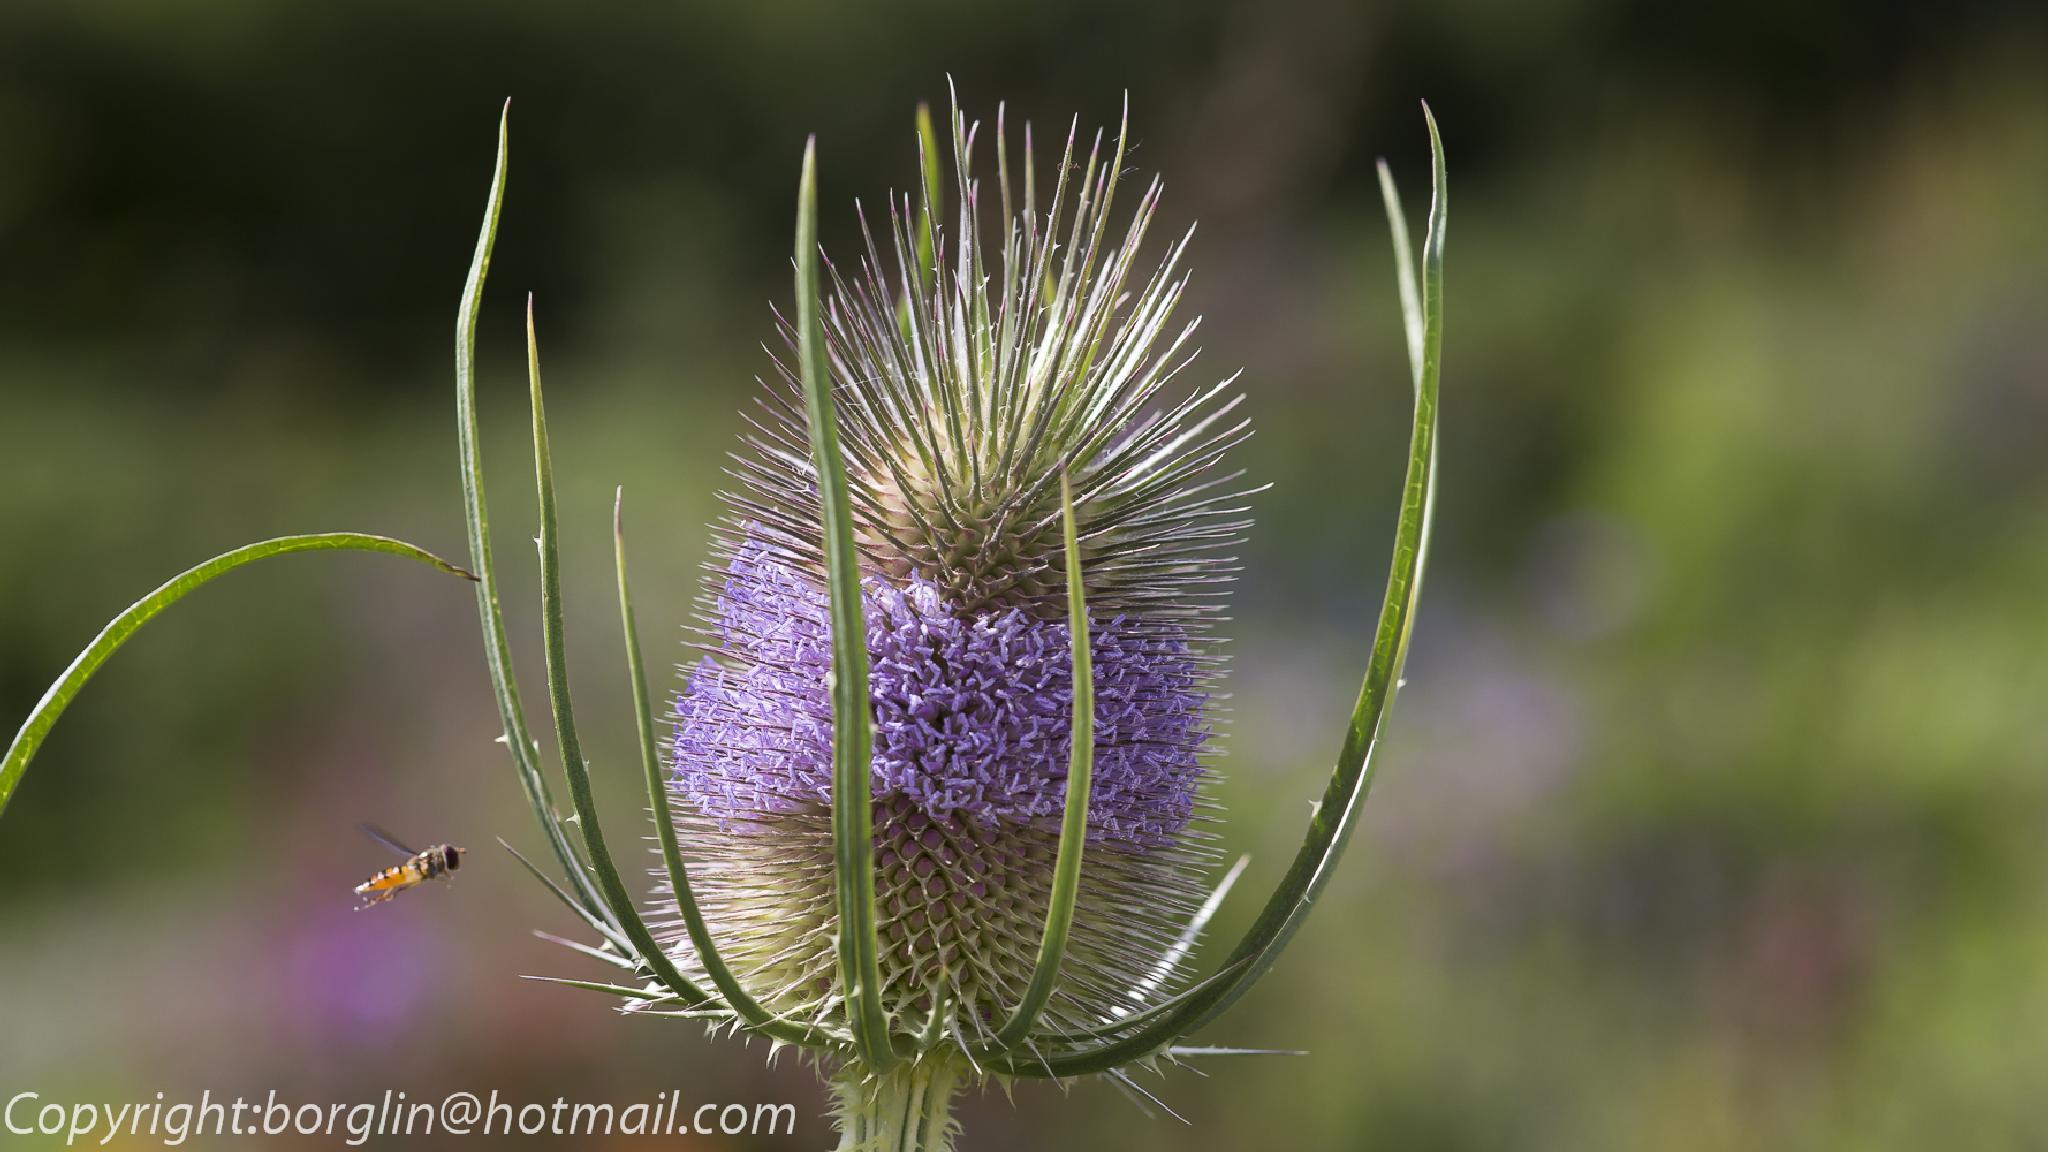 Stor växt mot liten blomfluga   Large plant against small hoverfly by Mats Borglin